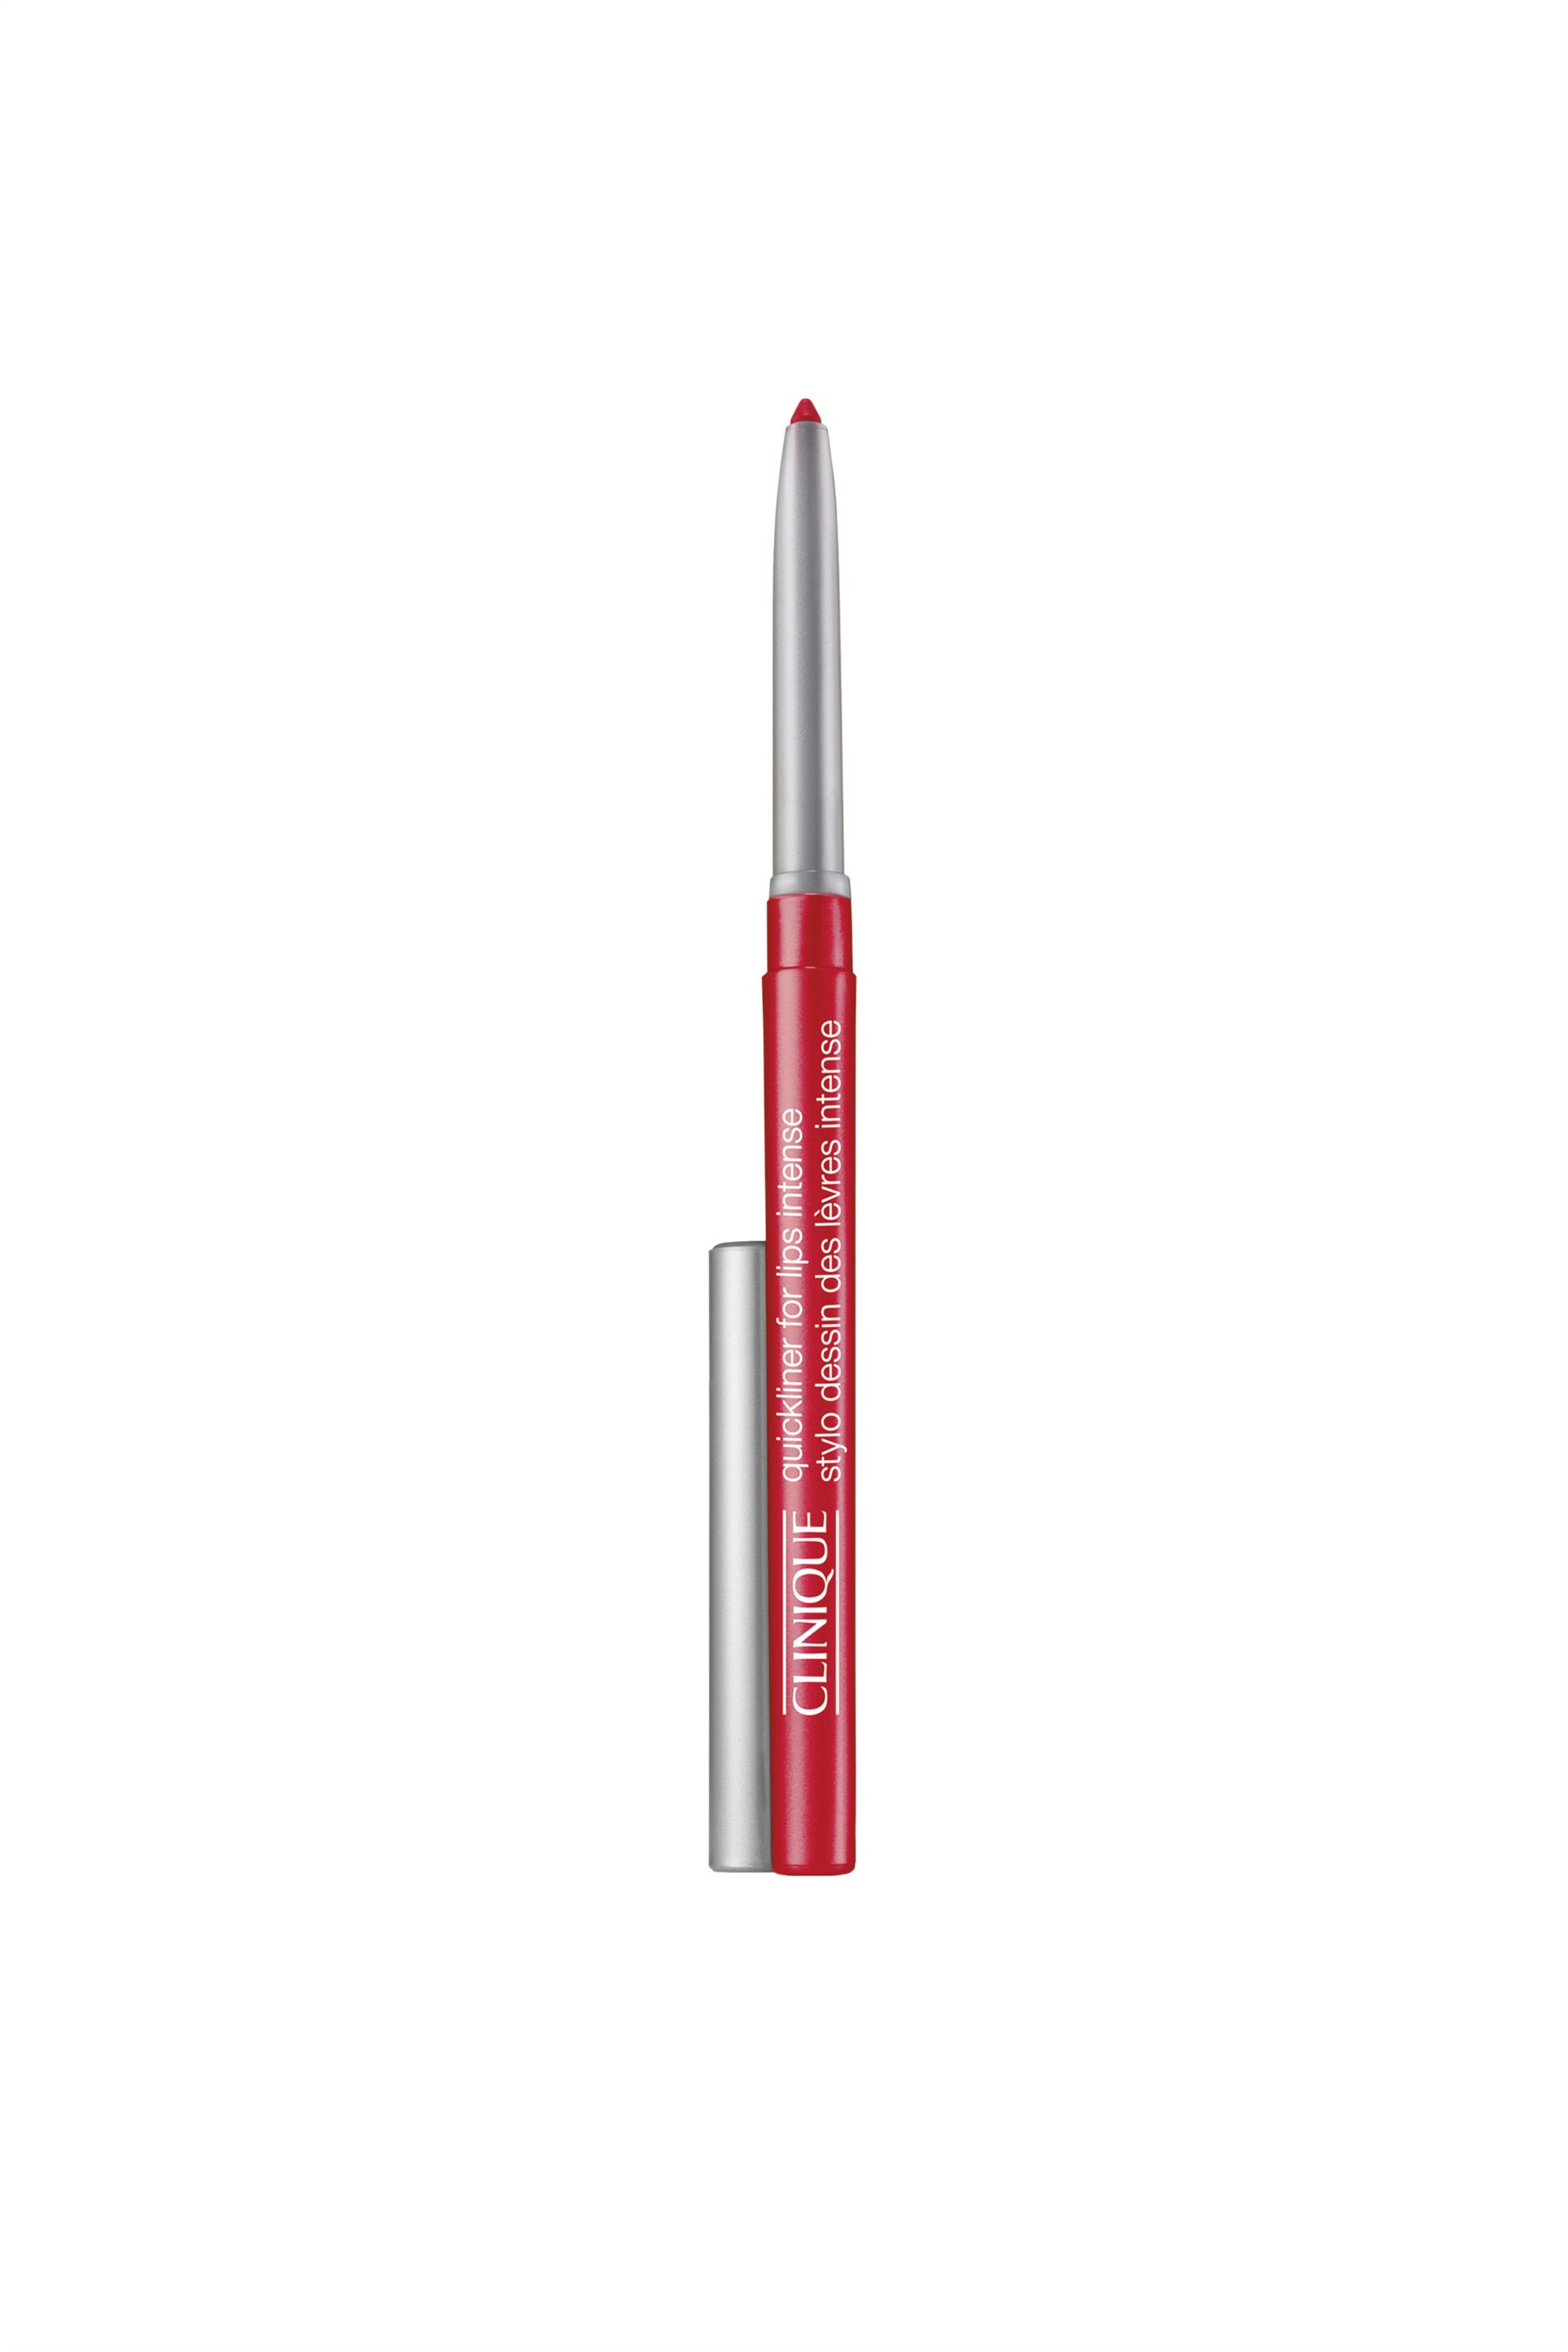 Clinique Quickliner™ for Lips Intense 05 Intense Passion 0.3 gr. - ZGGY050000 ομορφια   καλλυντικα επιλεκτικησ   μακιγιάζ   χείλη   μολύβια χειλιών